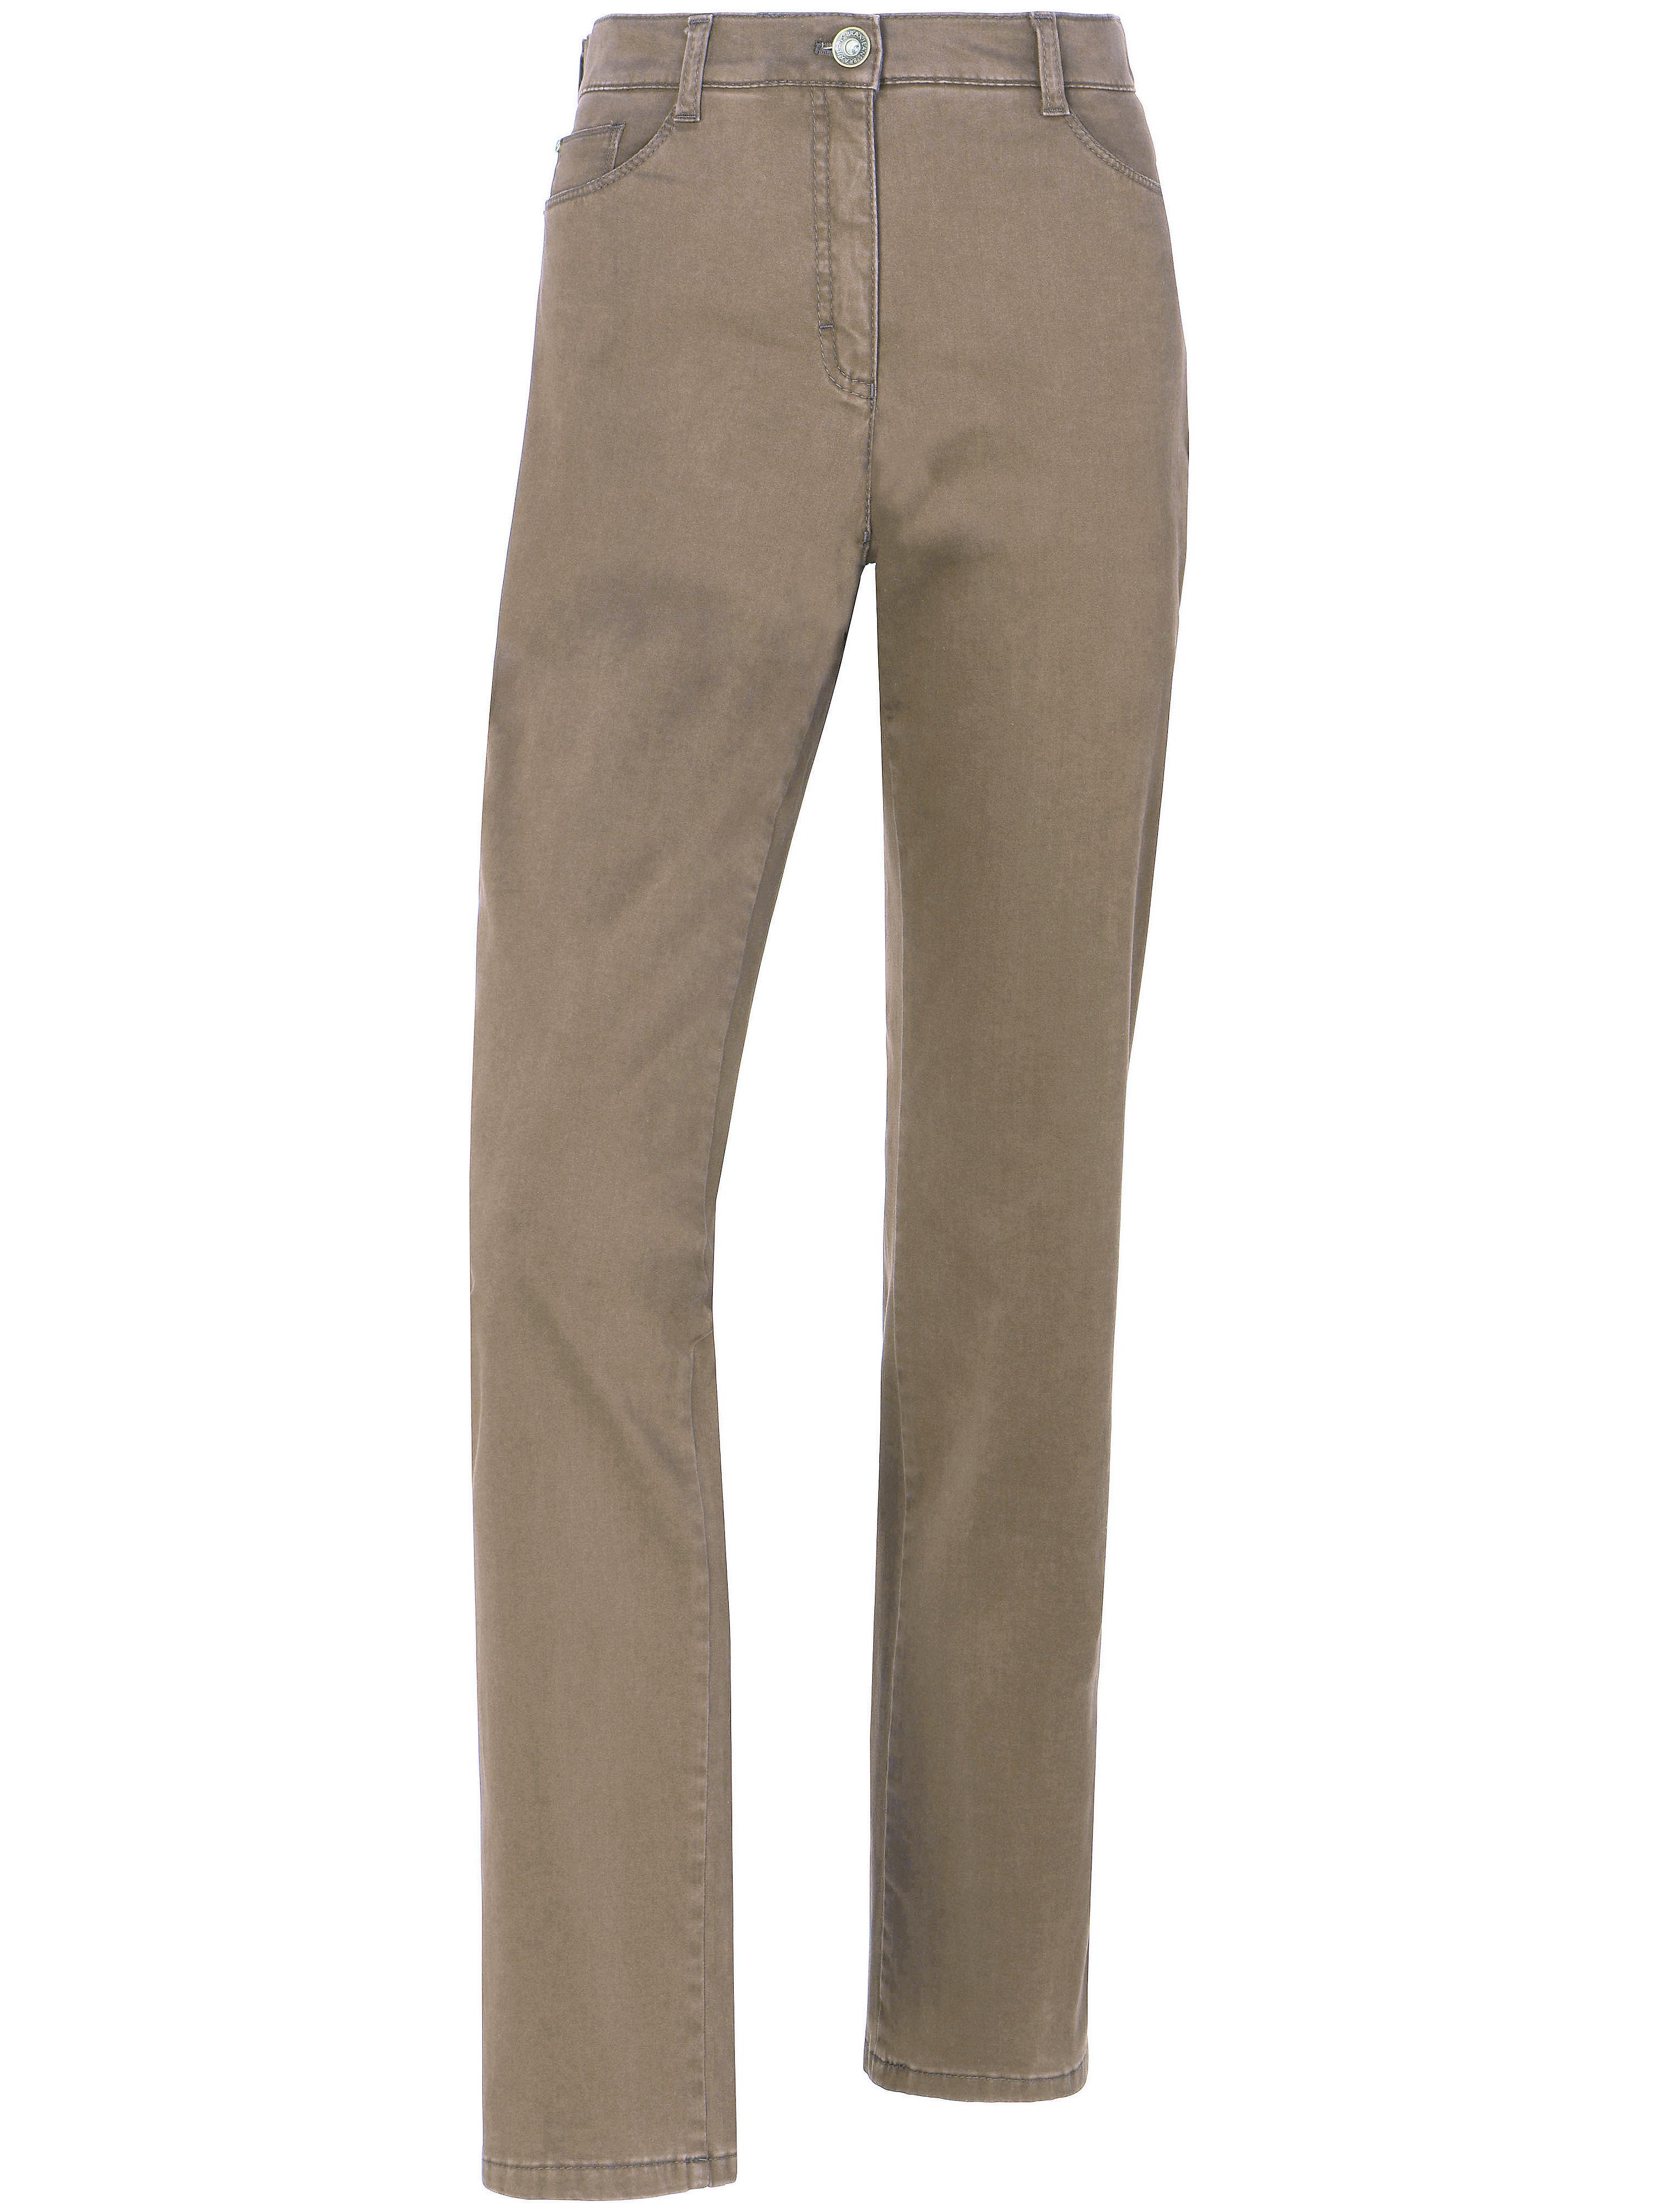 Image of   'Slim fit'-jeans - Model MARY GLAMOUR Fra Brax Feel Good beige